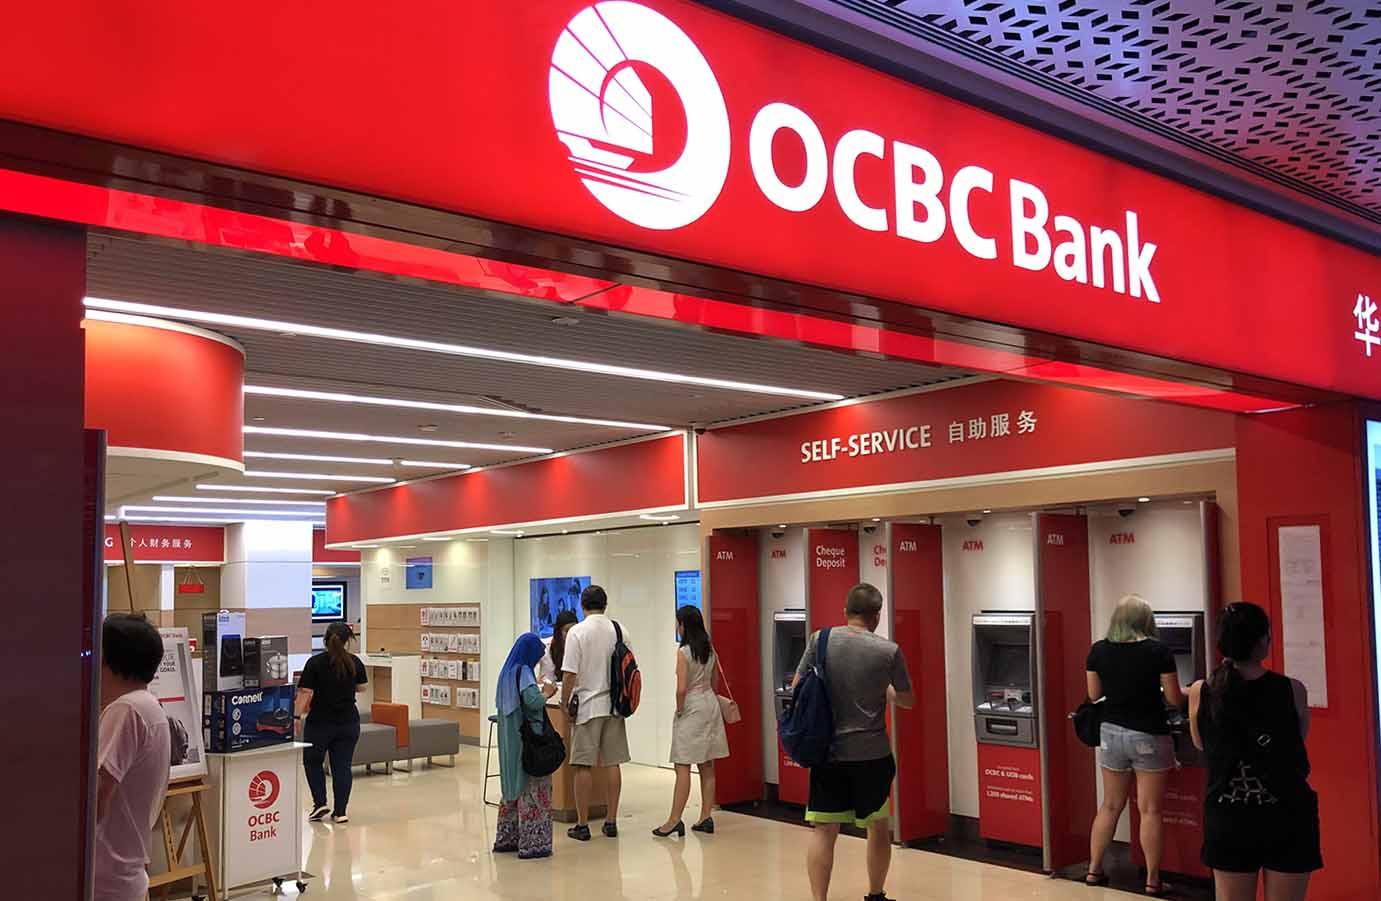 Li Chun 2019 Chinese New Year Auspicious Times to Deposit Money | SingSaver